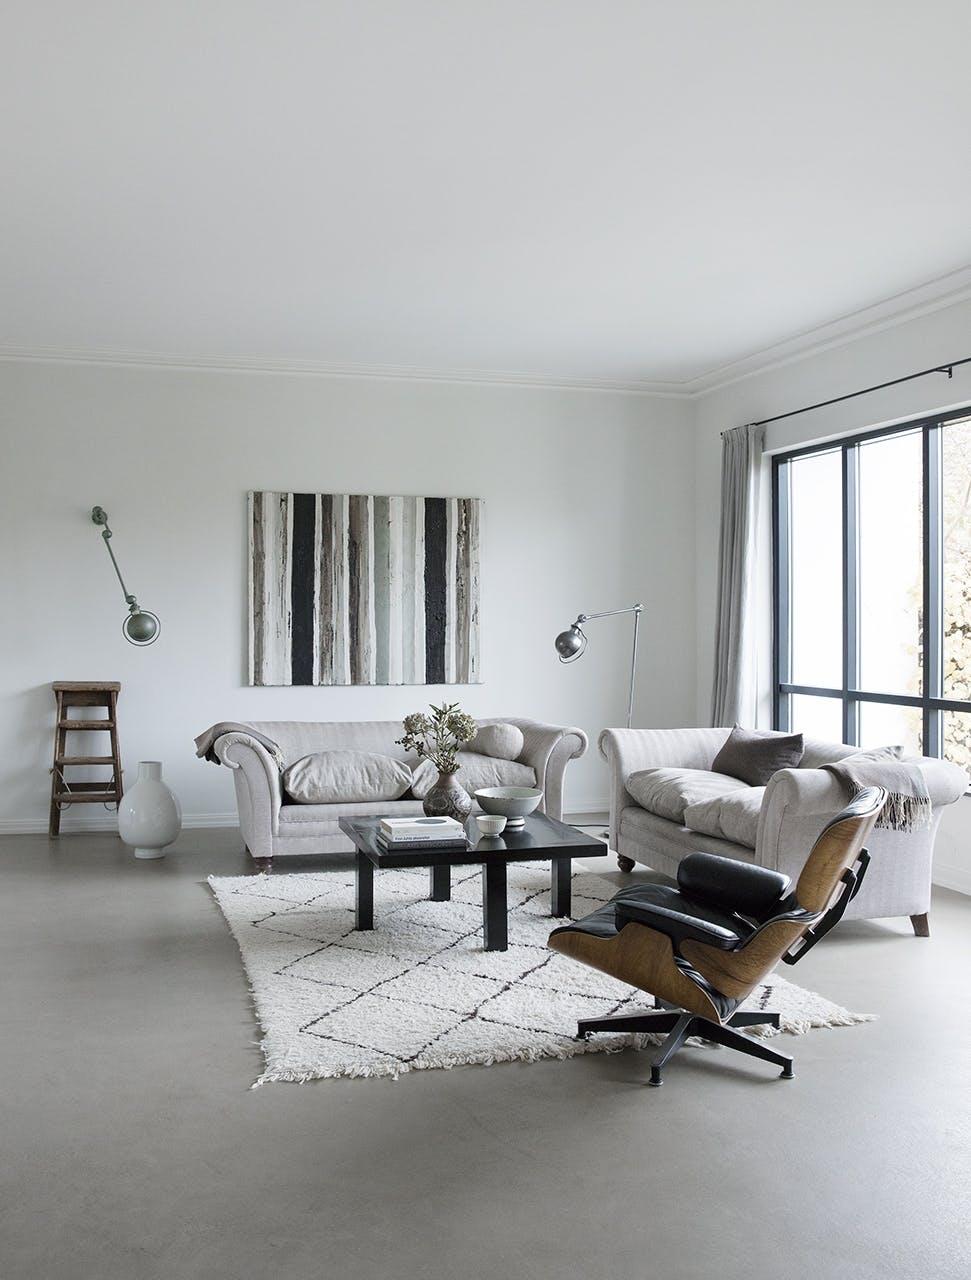 funkis hus frederiksberg indretning stue sofa